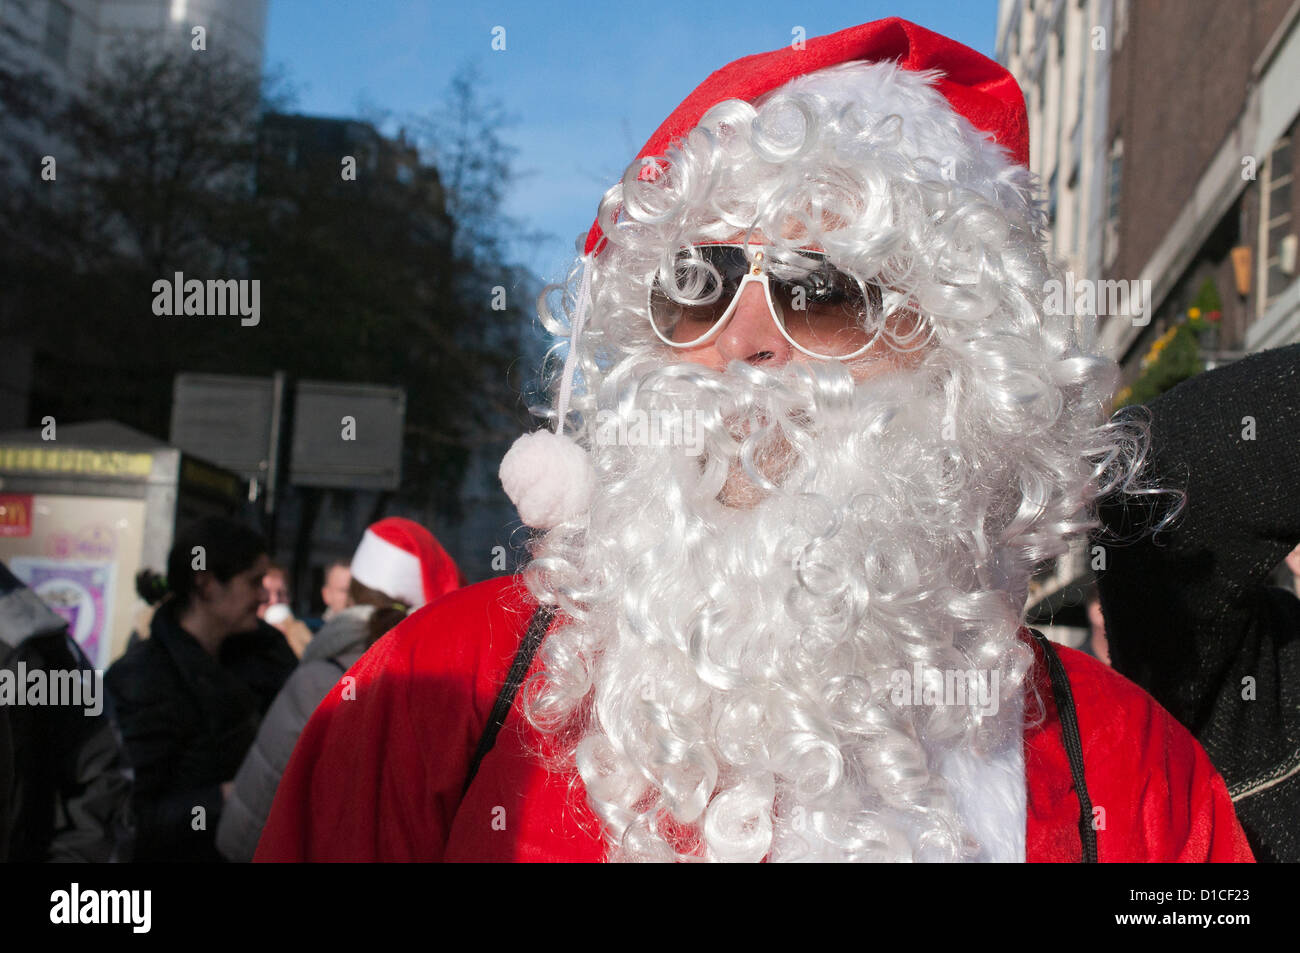 15 December 2012 London UK. Santa looks cool in shades as fancy dressed revellers roam central London during Santacon - Stock Image